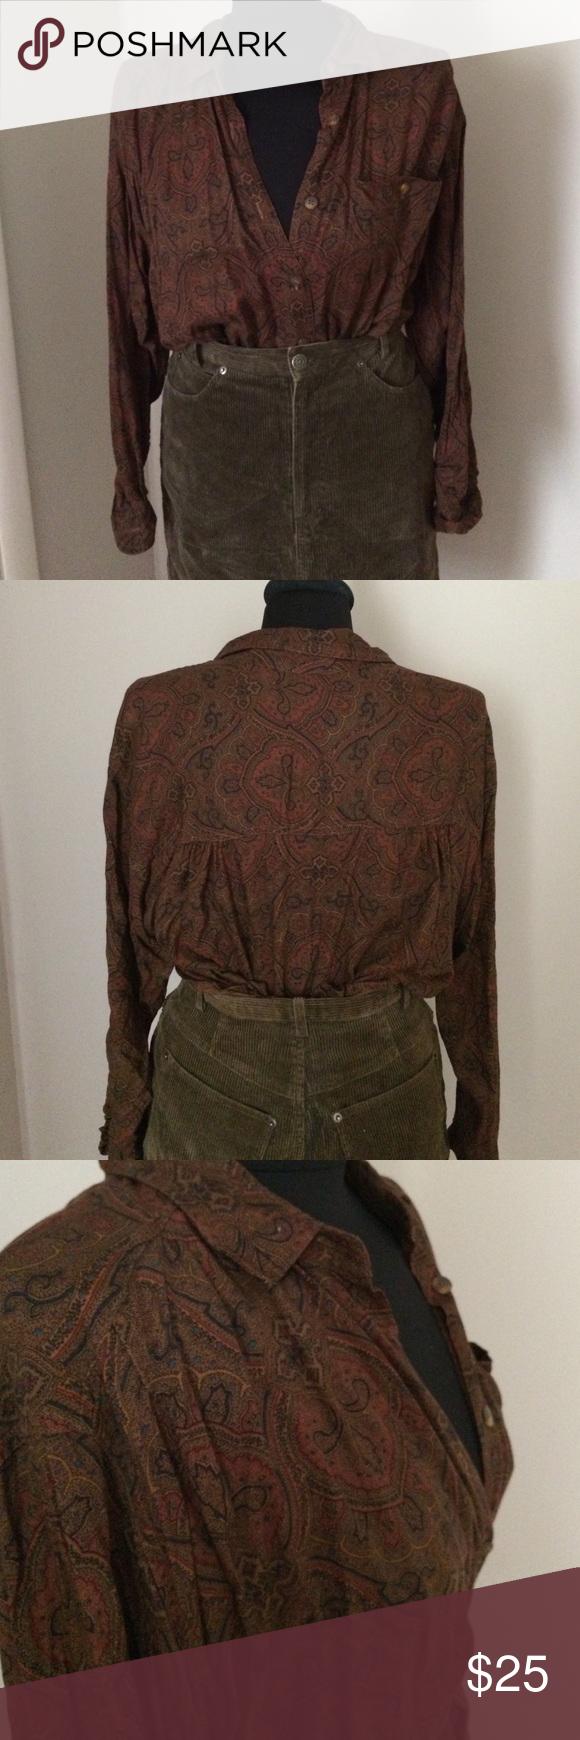 Paisley Liz Sport Blouse Paisley print button-down blouse. 100% Rayon. *Skirt sold separately* Liz Sport Tops Button Down Shirts